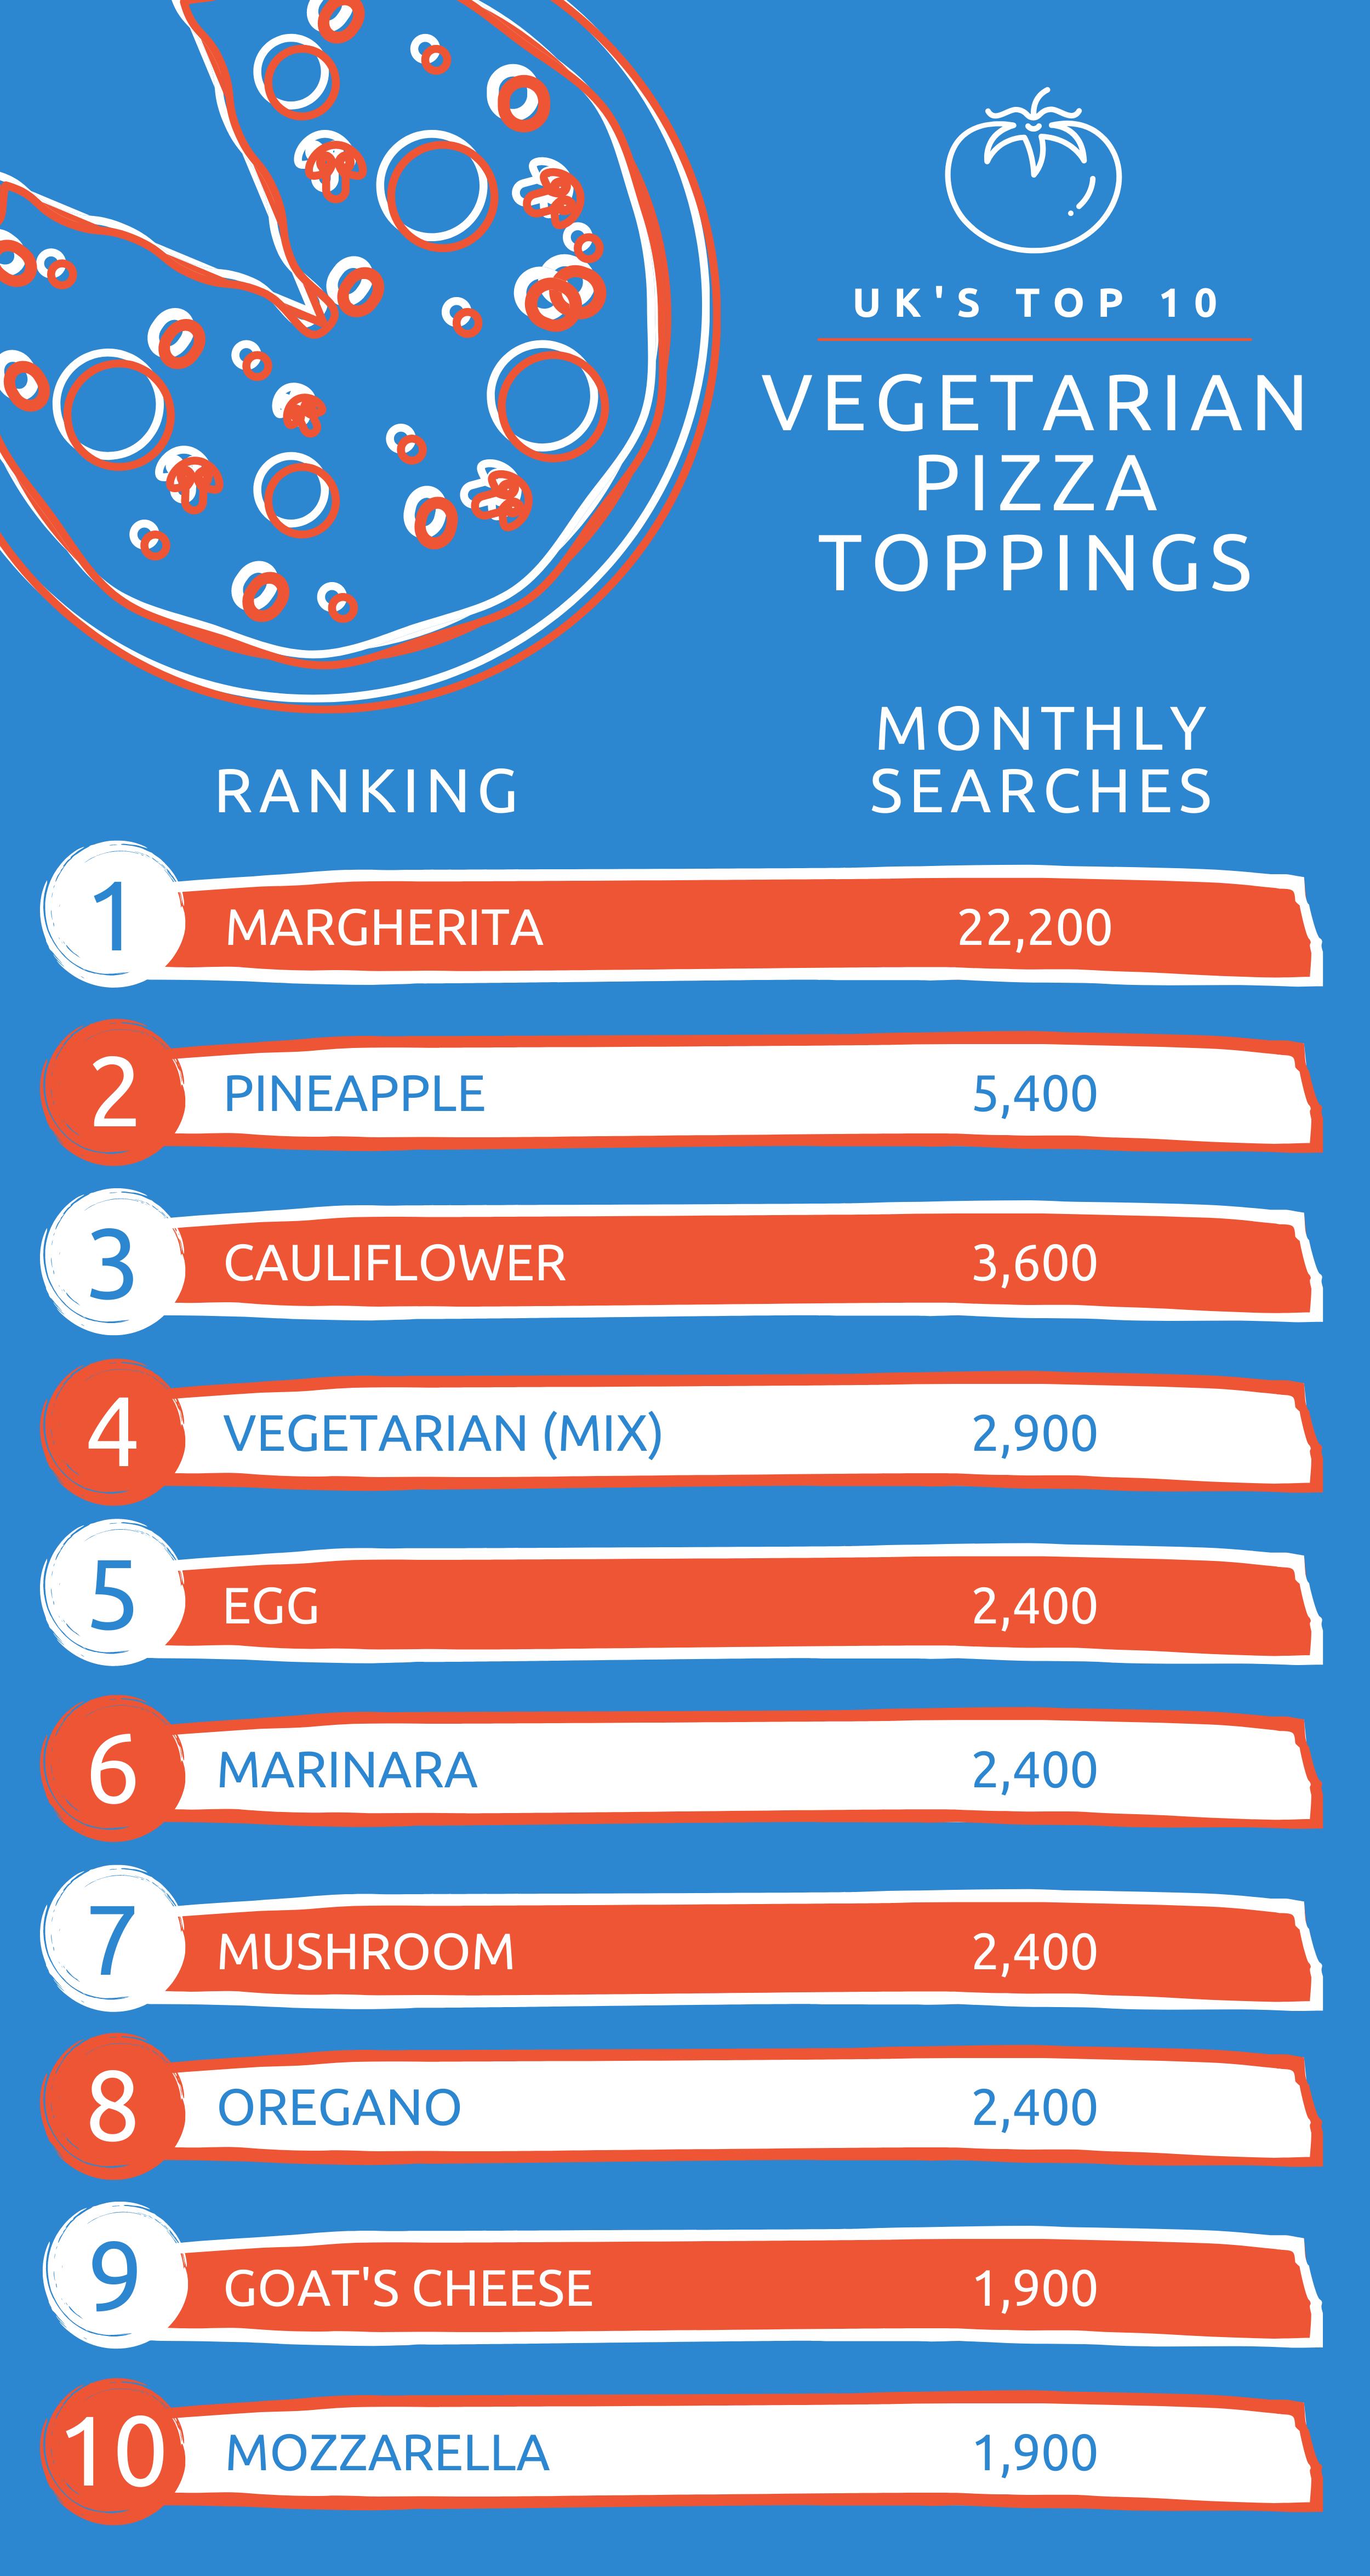 UK's Top 10 Vegetarian Pizza Toppings